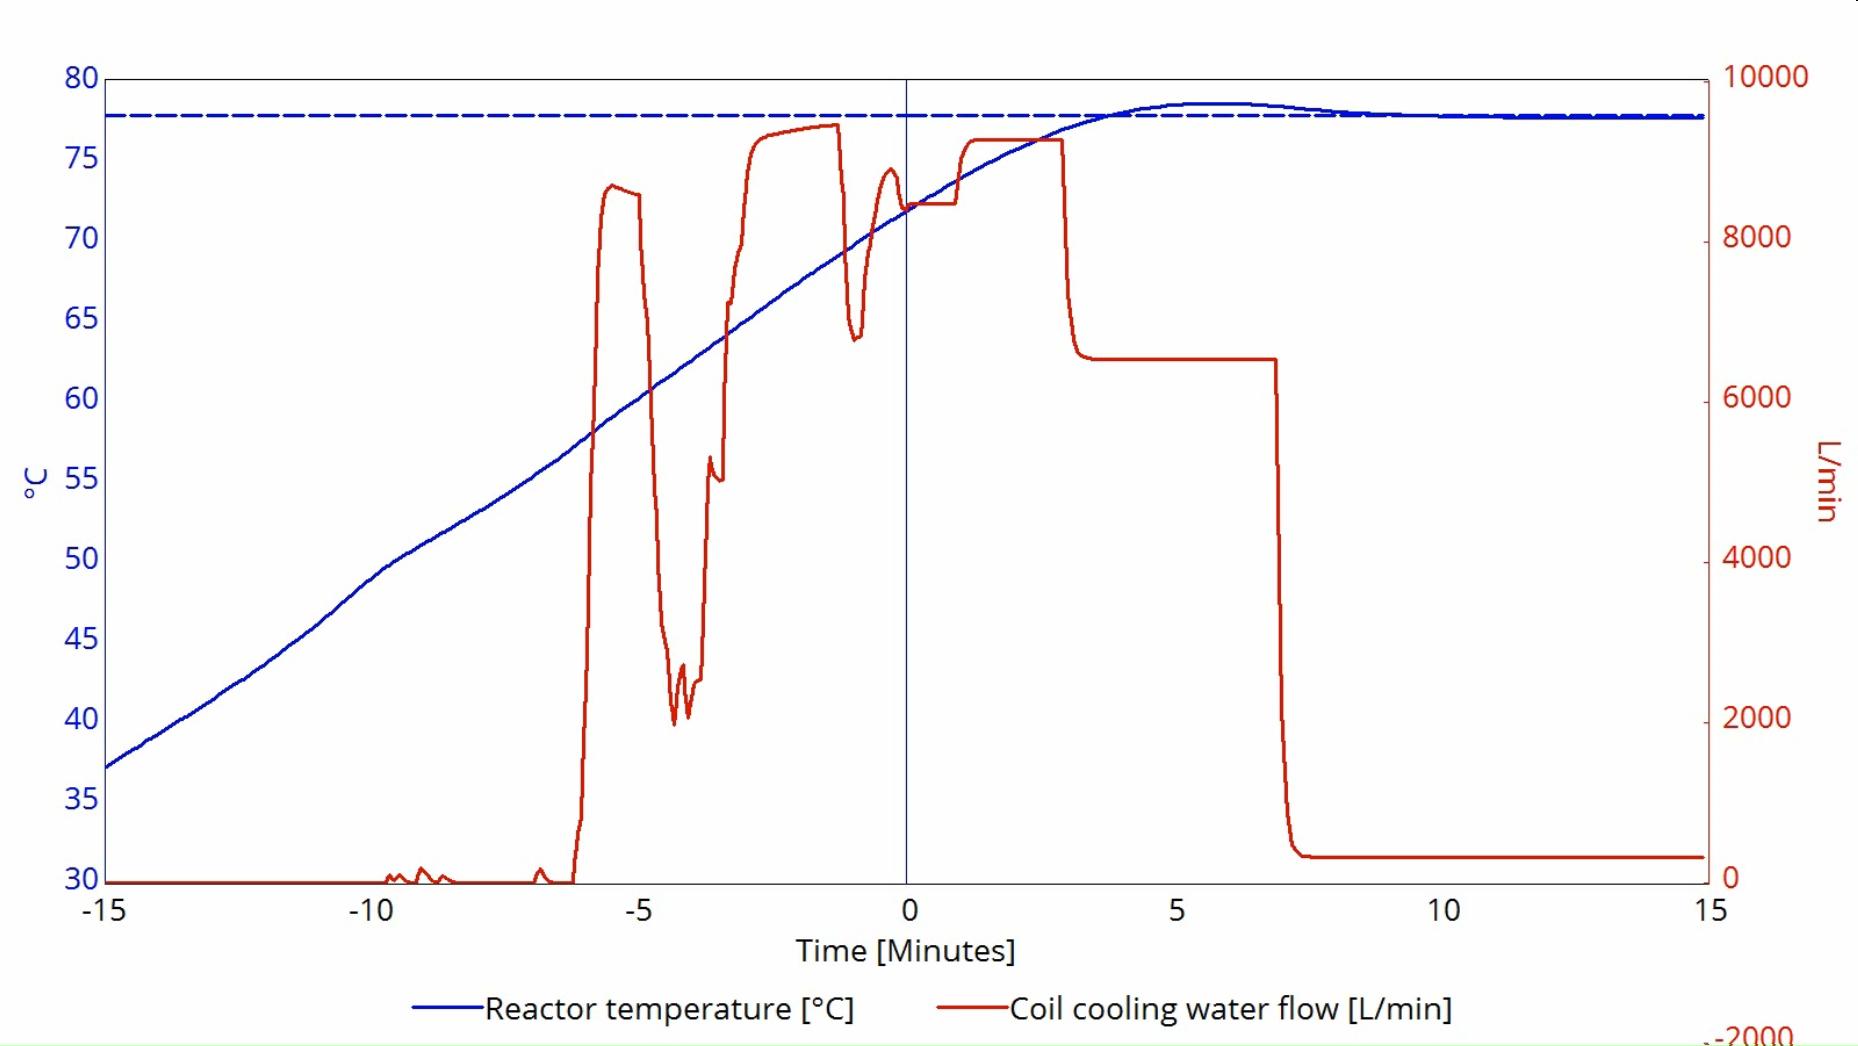 Model Predictive Control Of Phenolic Resin Production Cybernetica Process Flow Diagram Reactor 0000